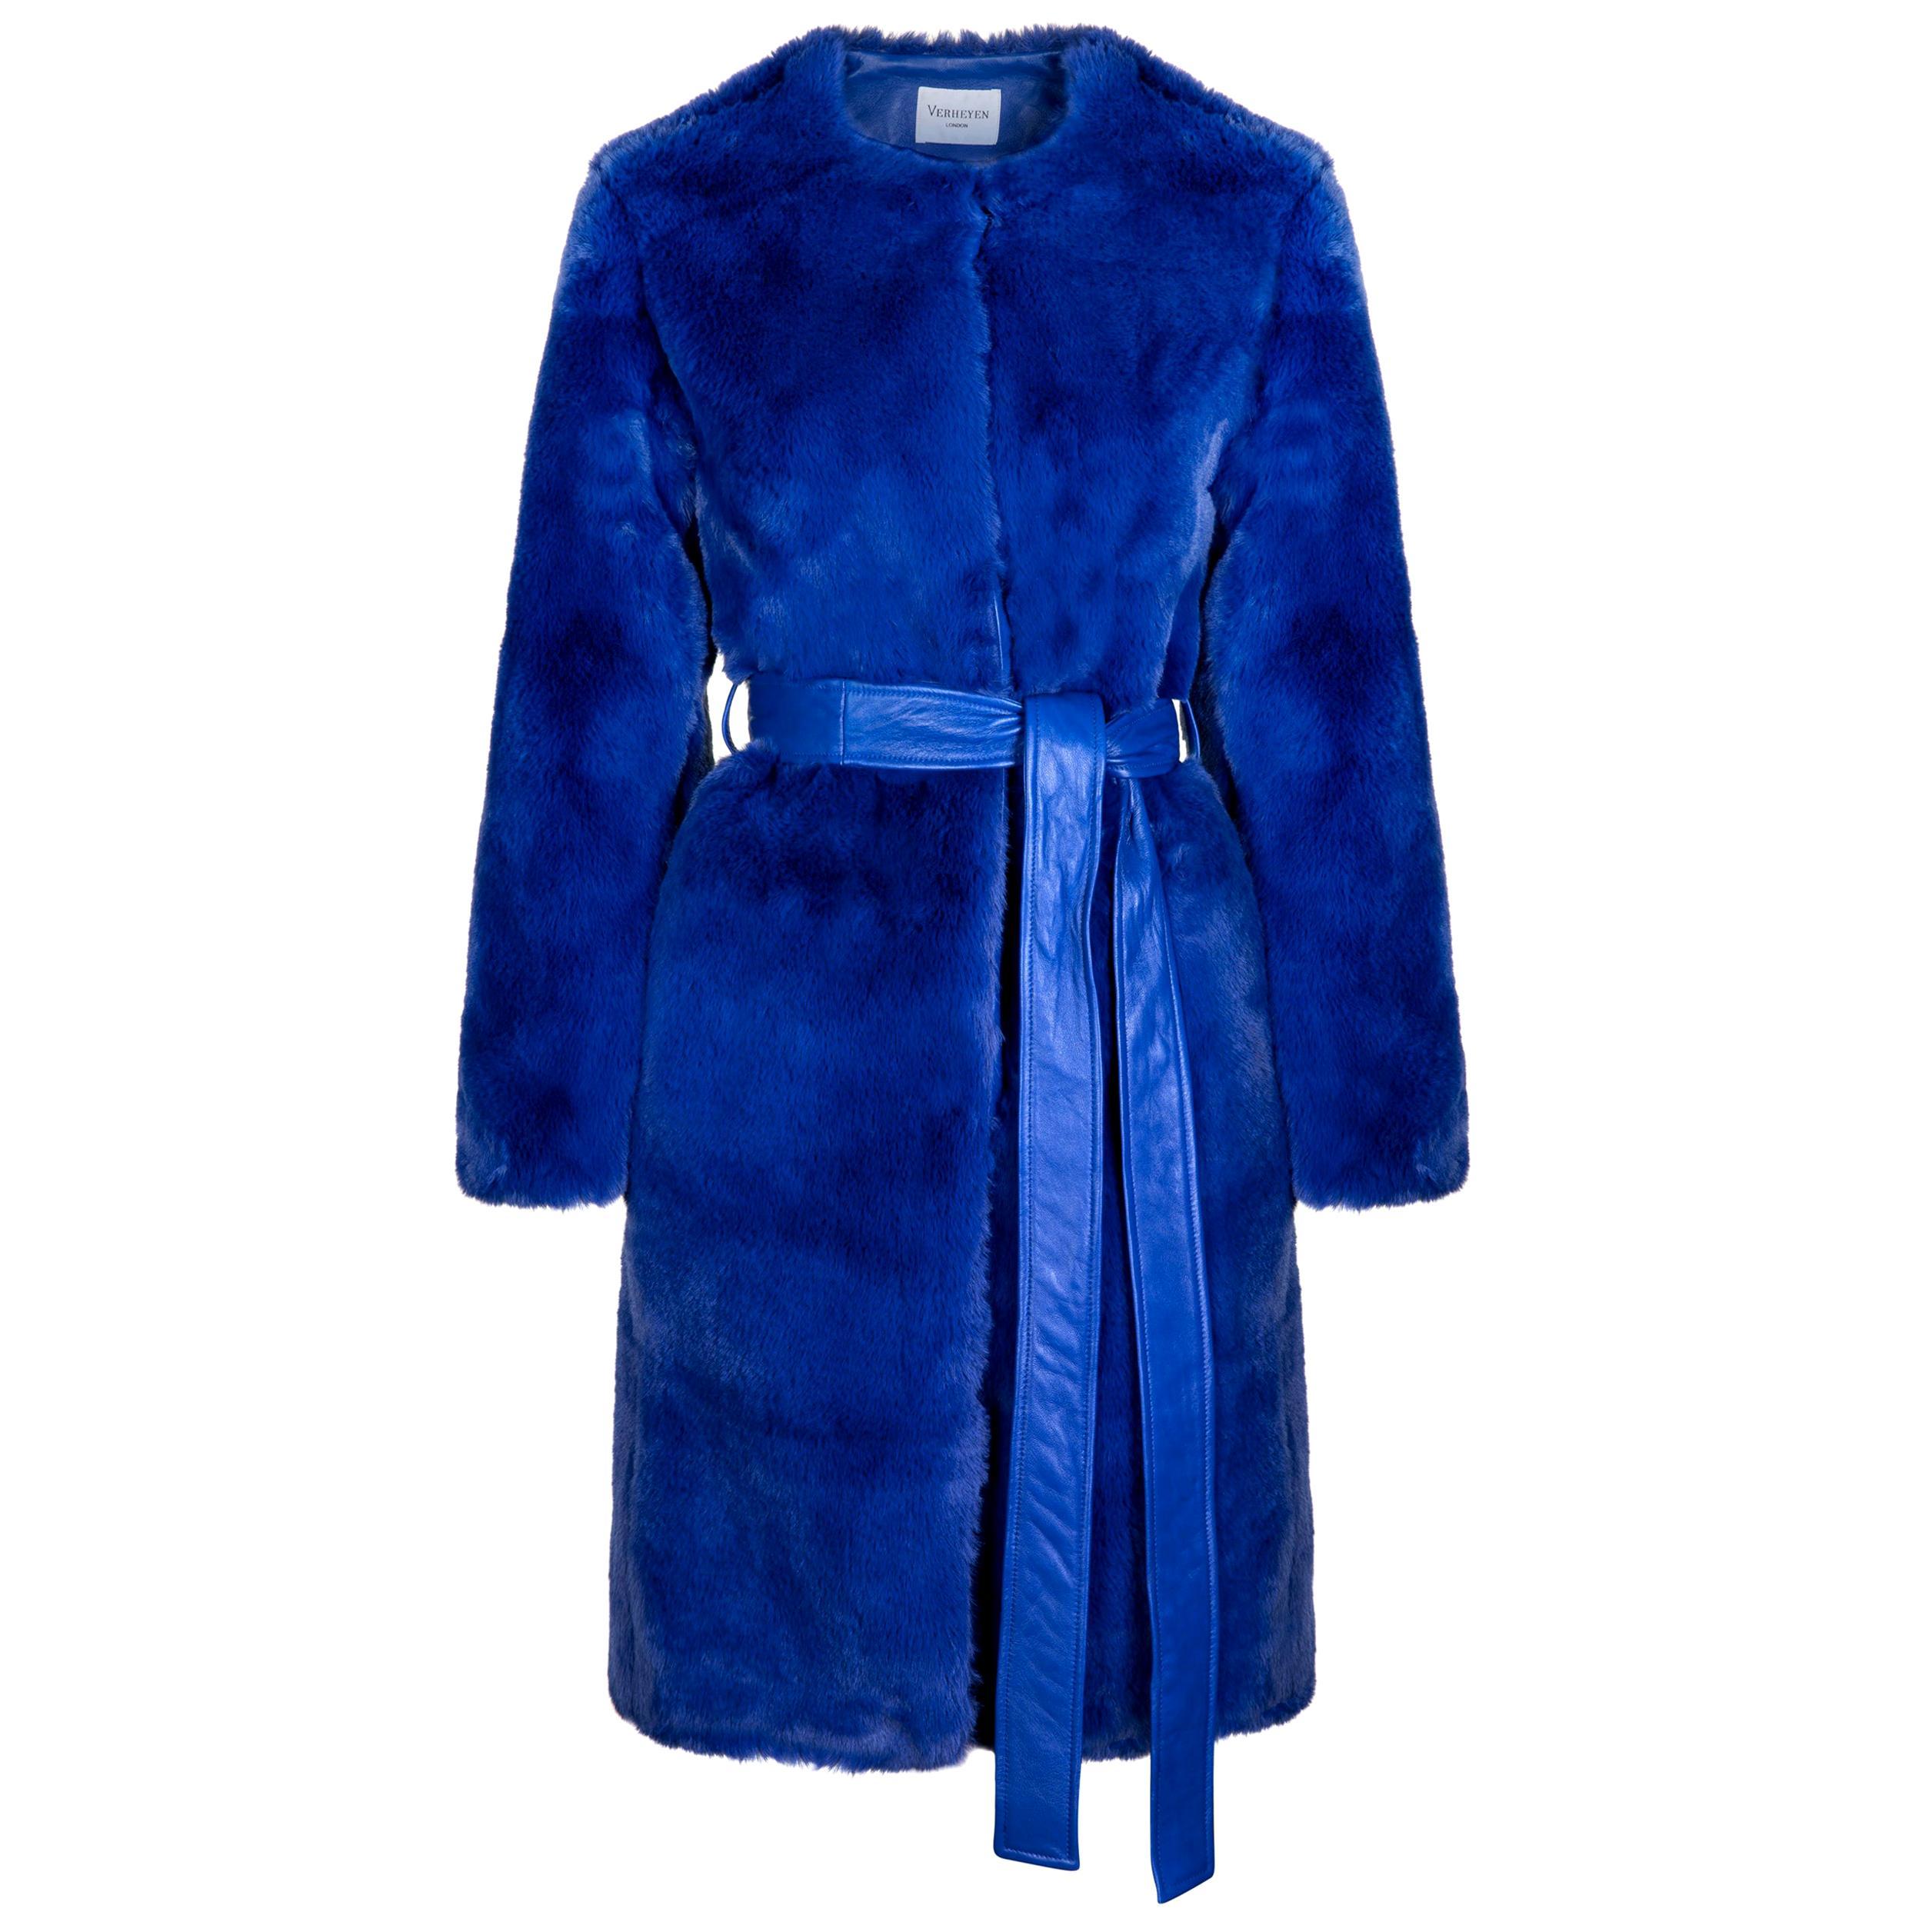 Verheyen London Serena  Collarless Faux Fur Coat in Blue - Size uk 10